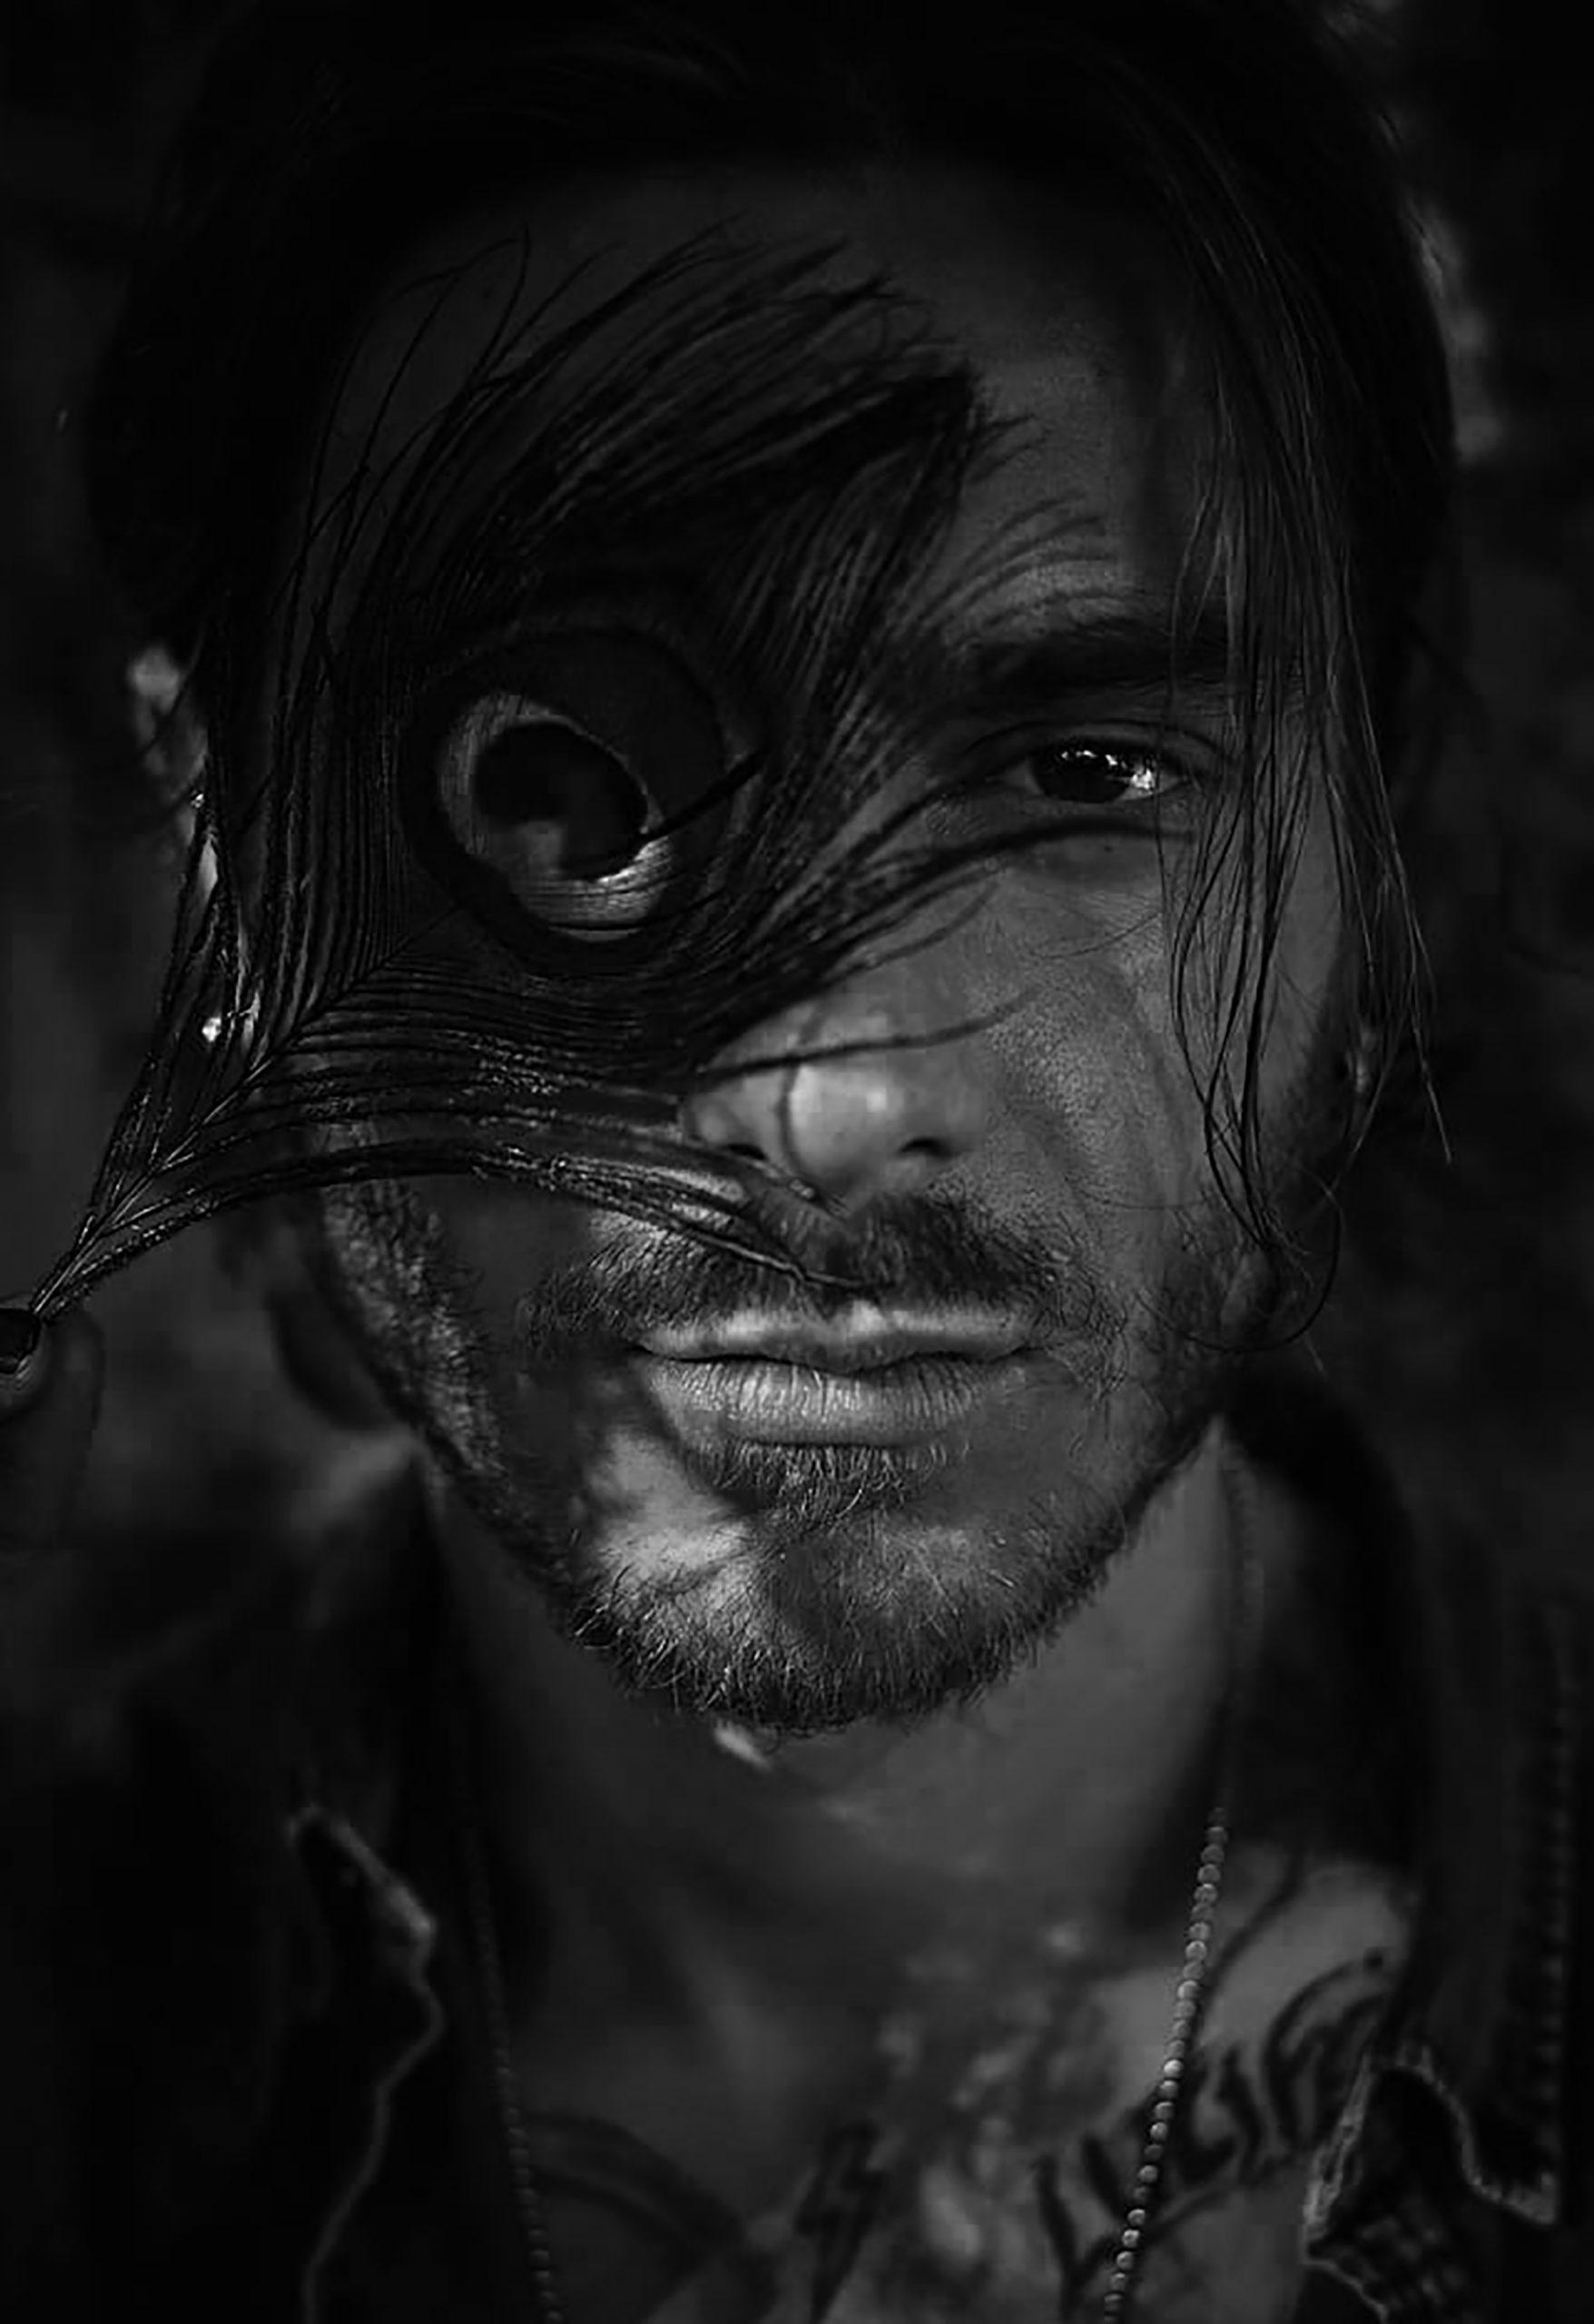 Categorie: Portrait - Photographer: IRENE FITTIPALDI - Model: GUGLIELMO GAUDIOSO - Location: Roma, RM, Italia